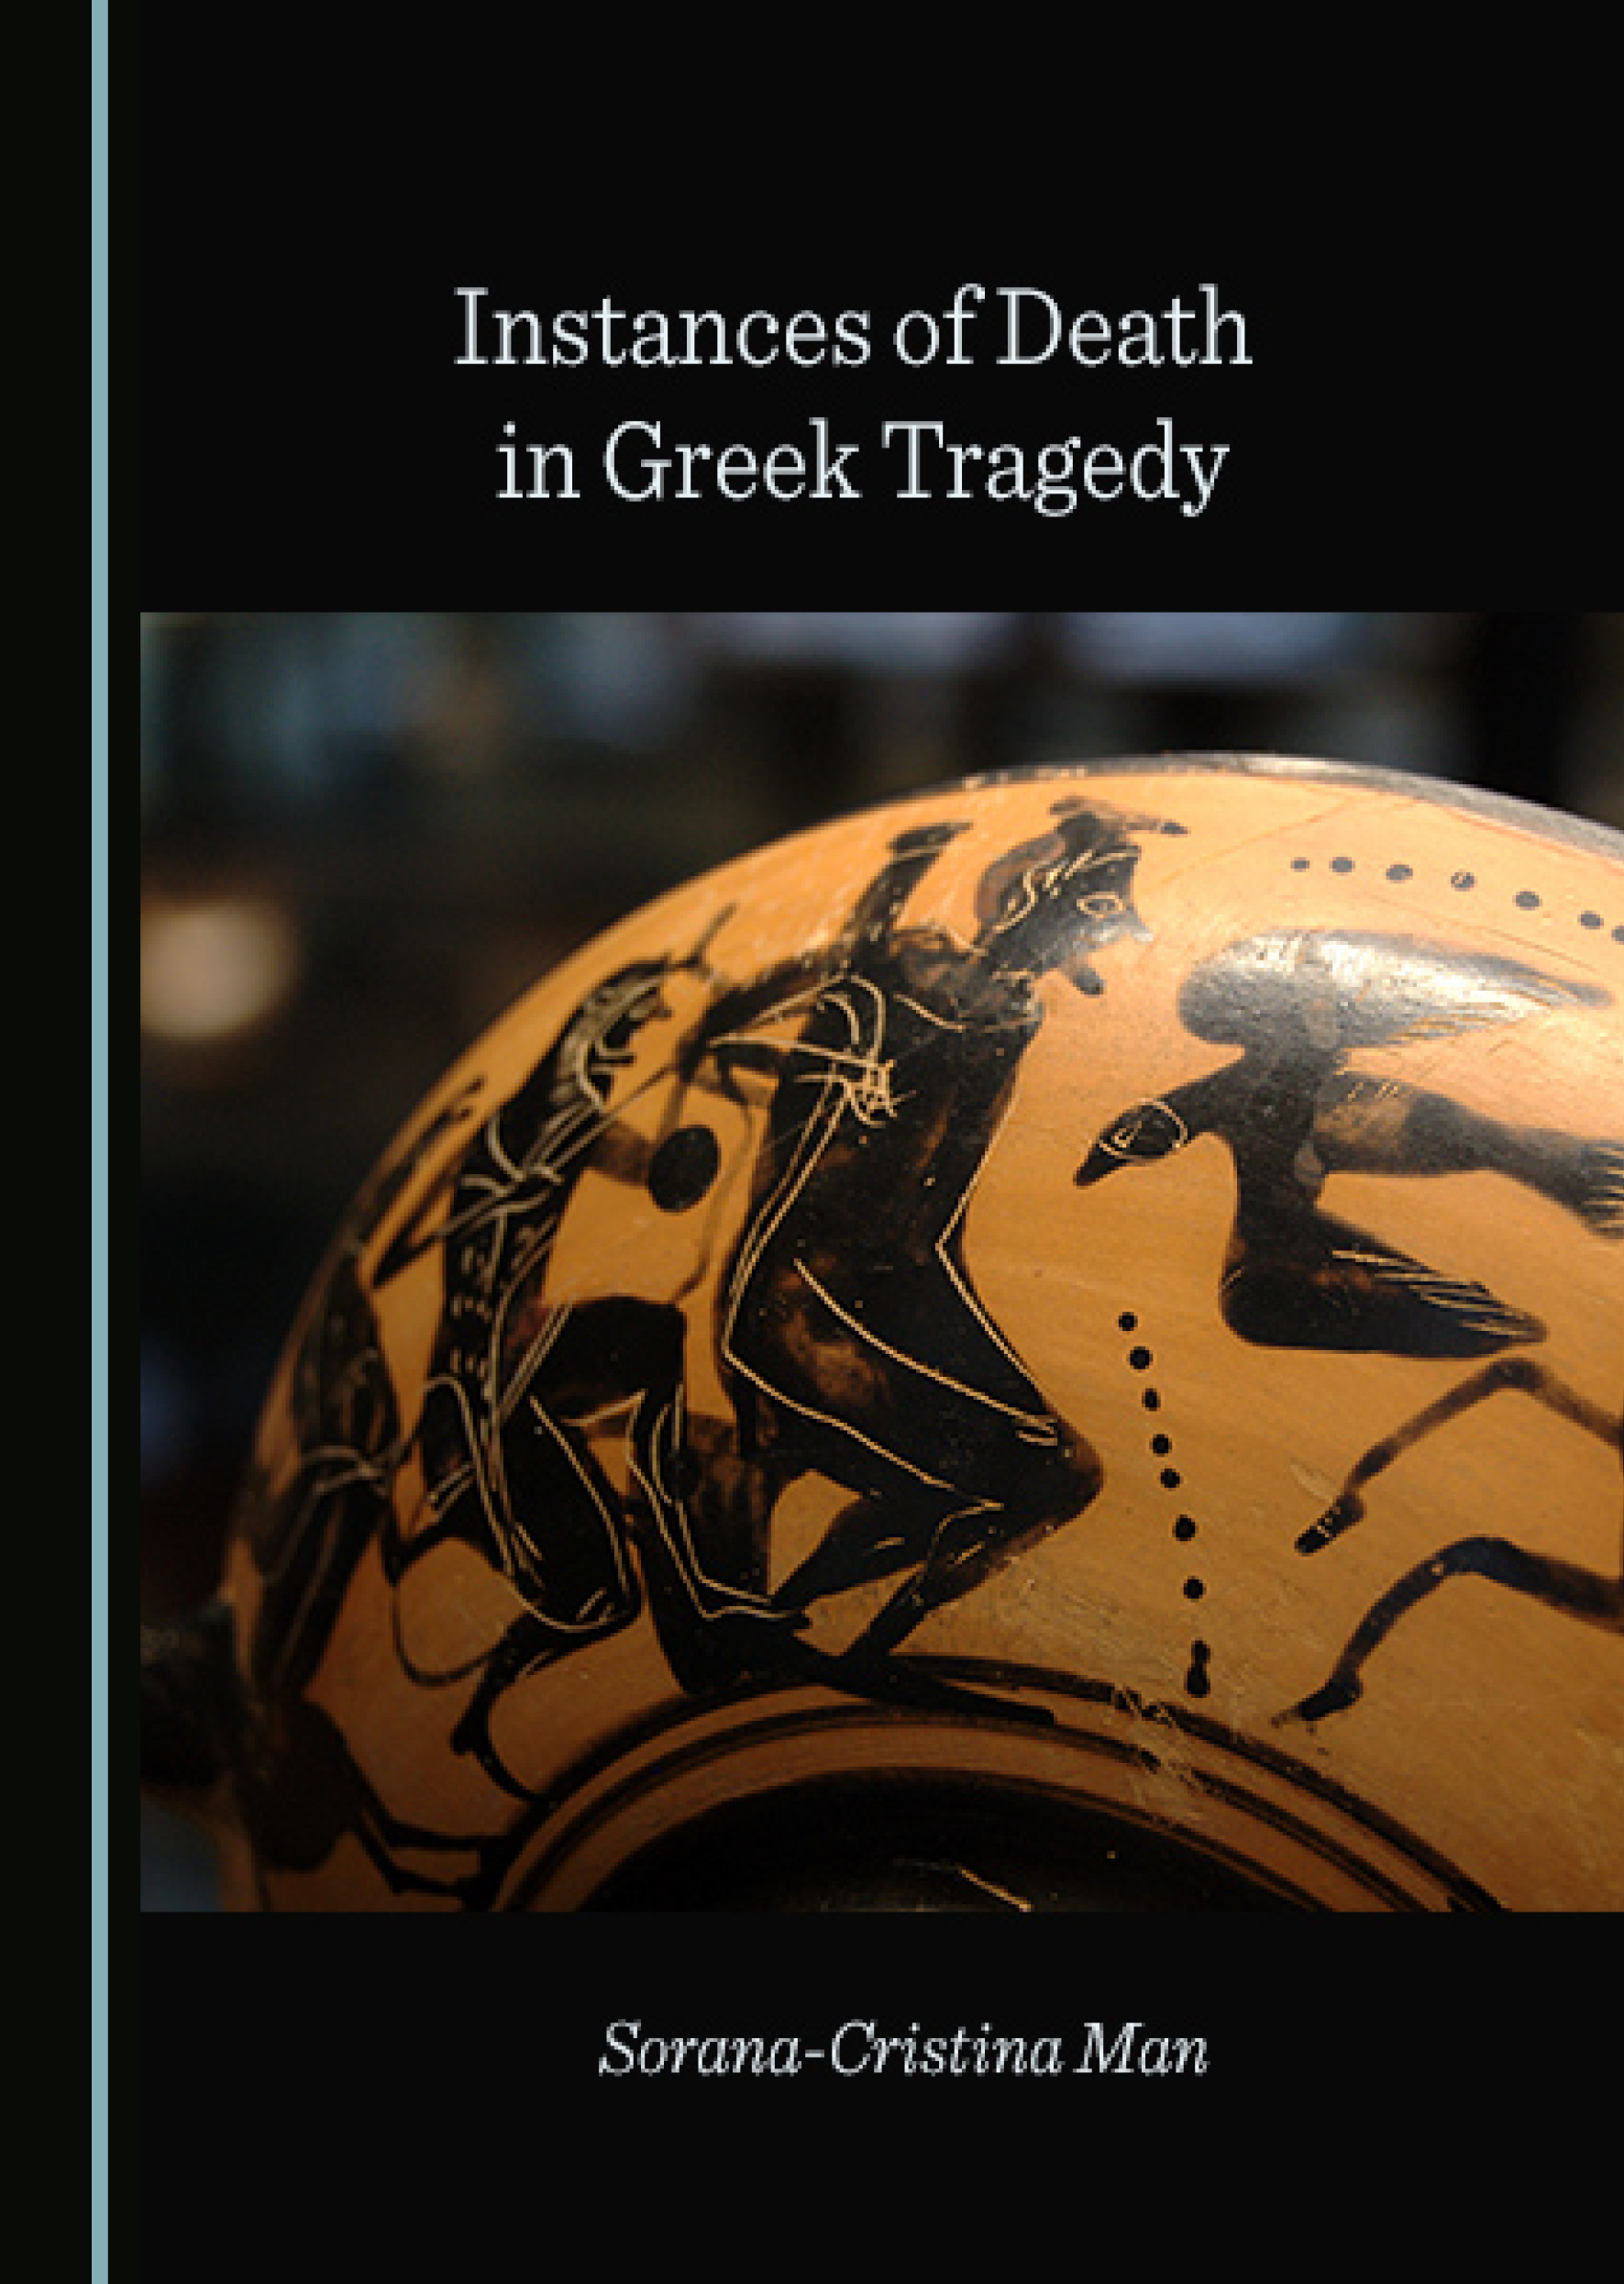 Instances of Death in Greek Tragedy